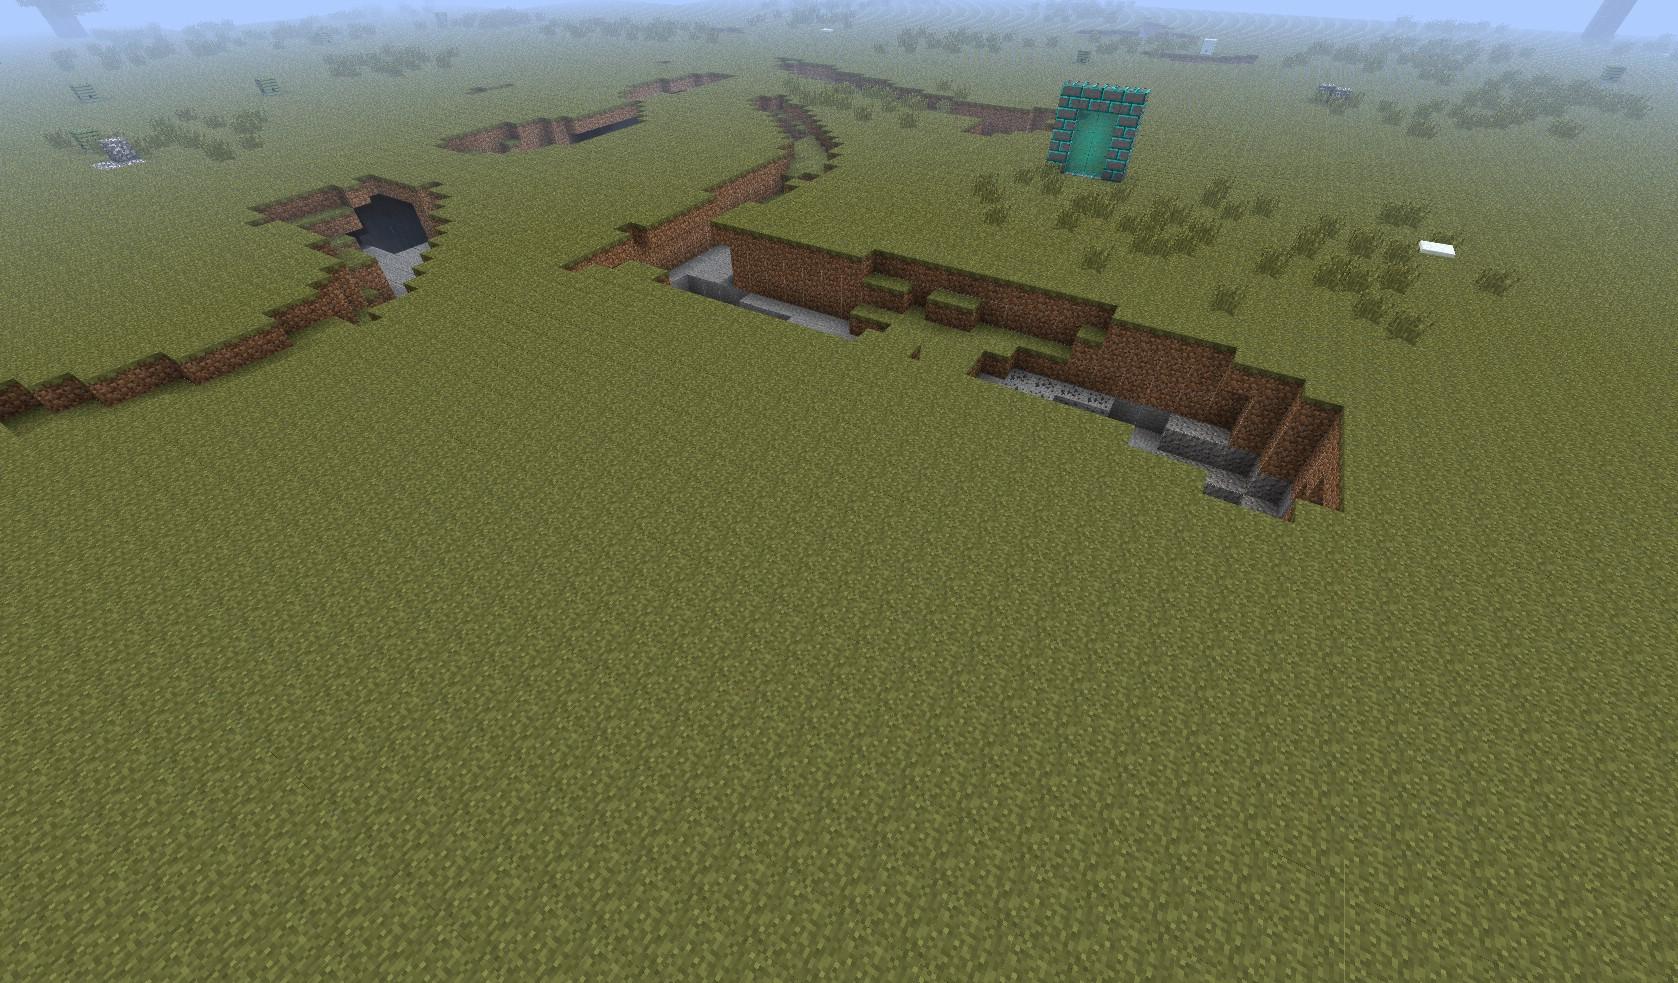 http://img.niceminecraft.net/Mods/Mining-Dimensional-World-Mod-1.jpg